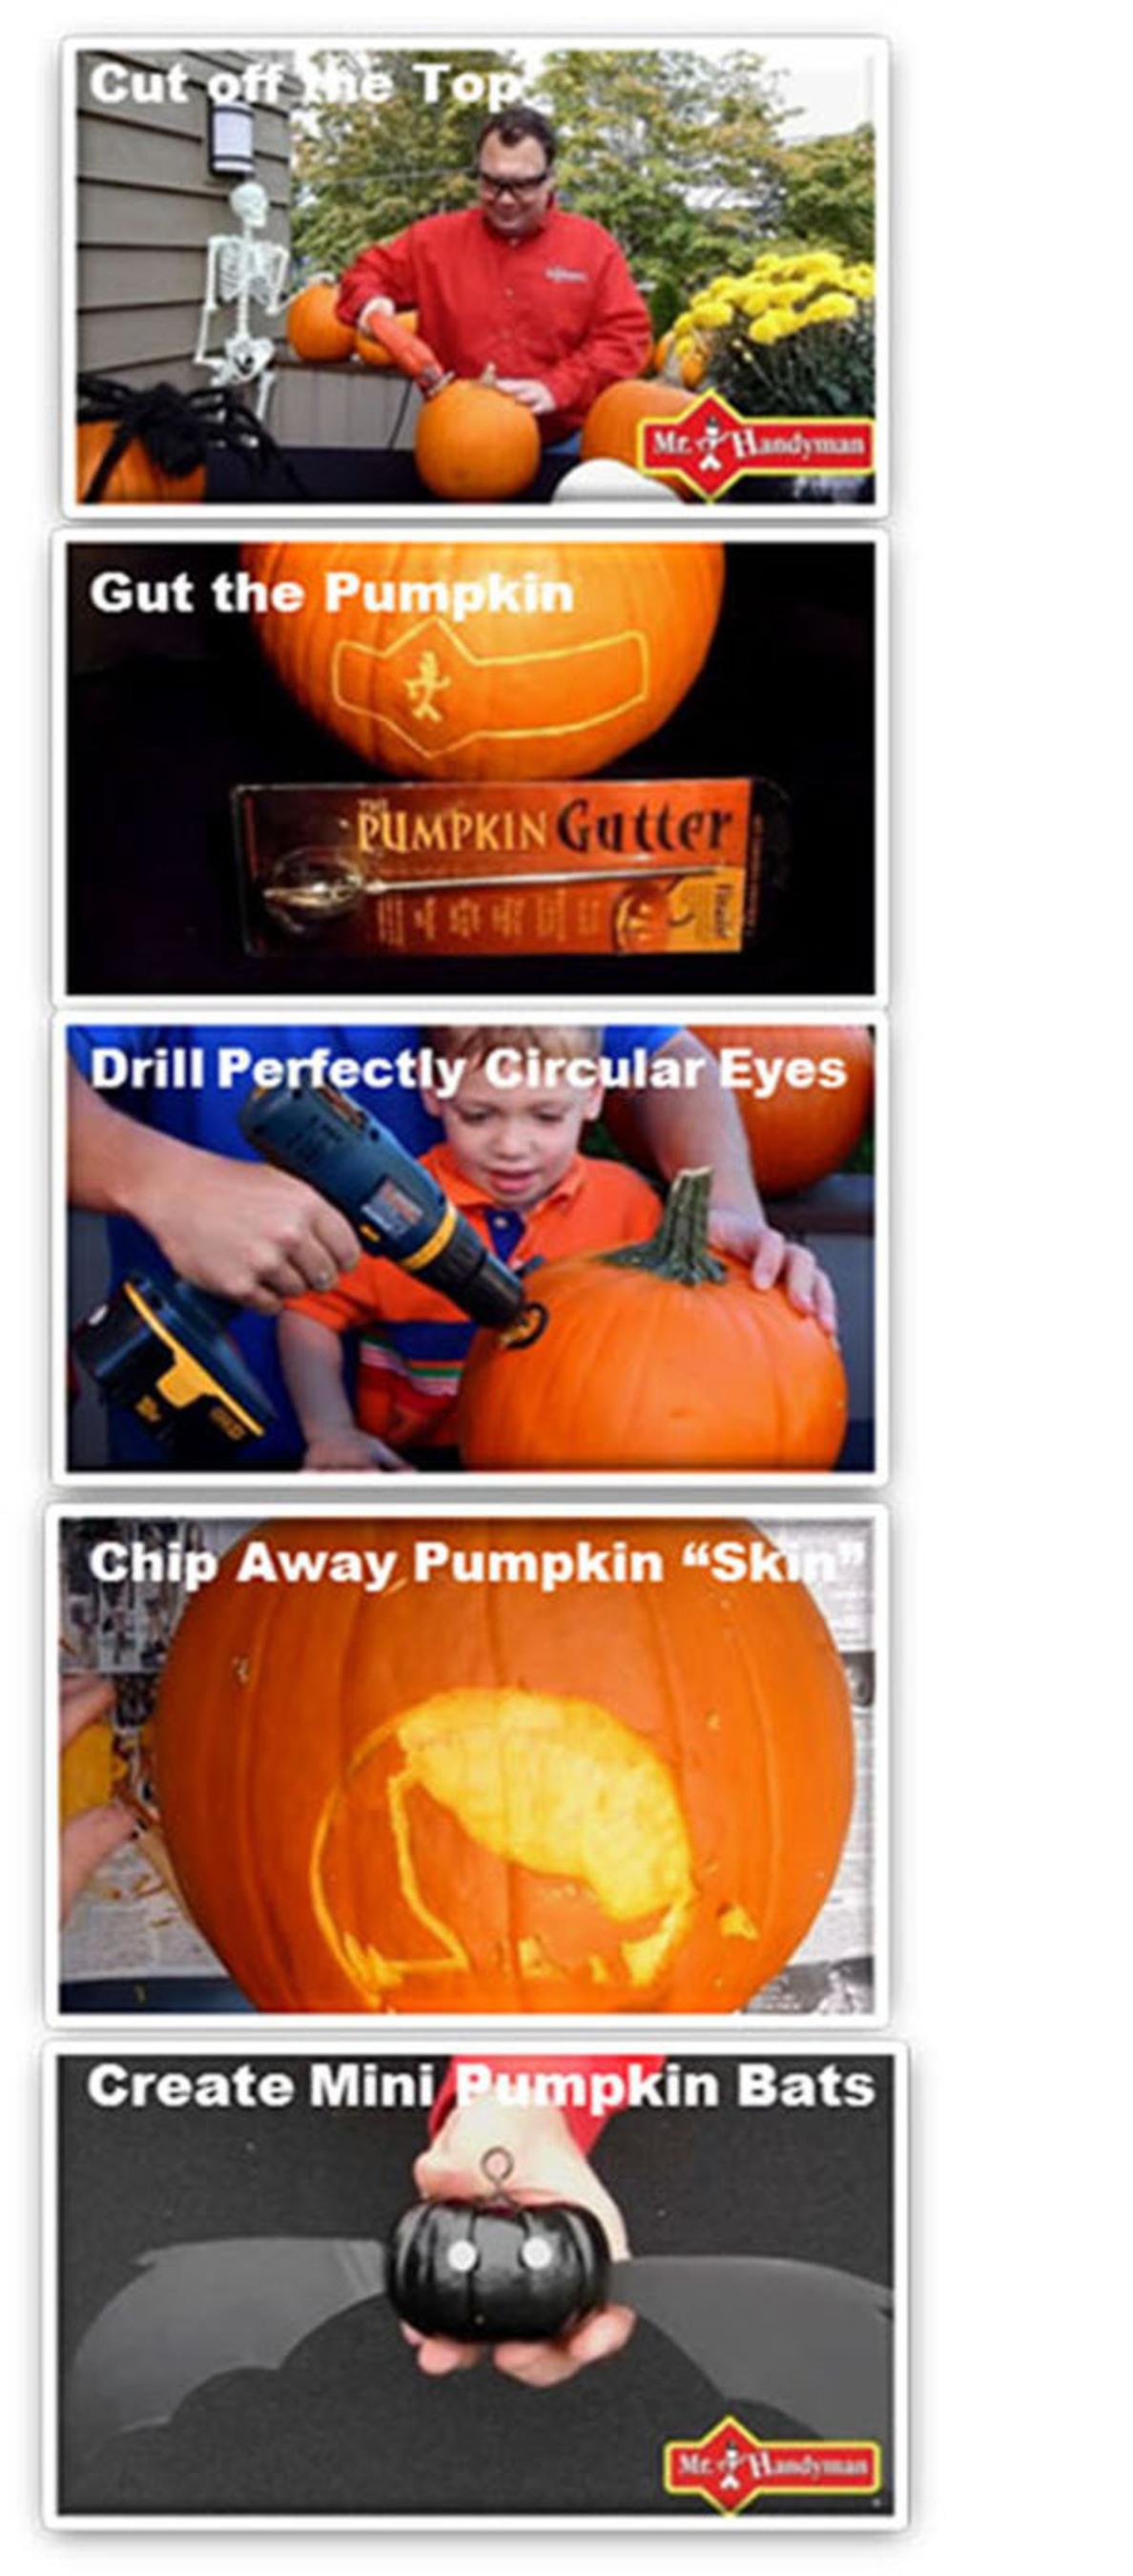 Mr. Handyman Shares Tips for Pumpkin Carving with Power Tools.  (PRNewsFoto/Mr. Handyman)